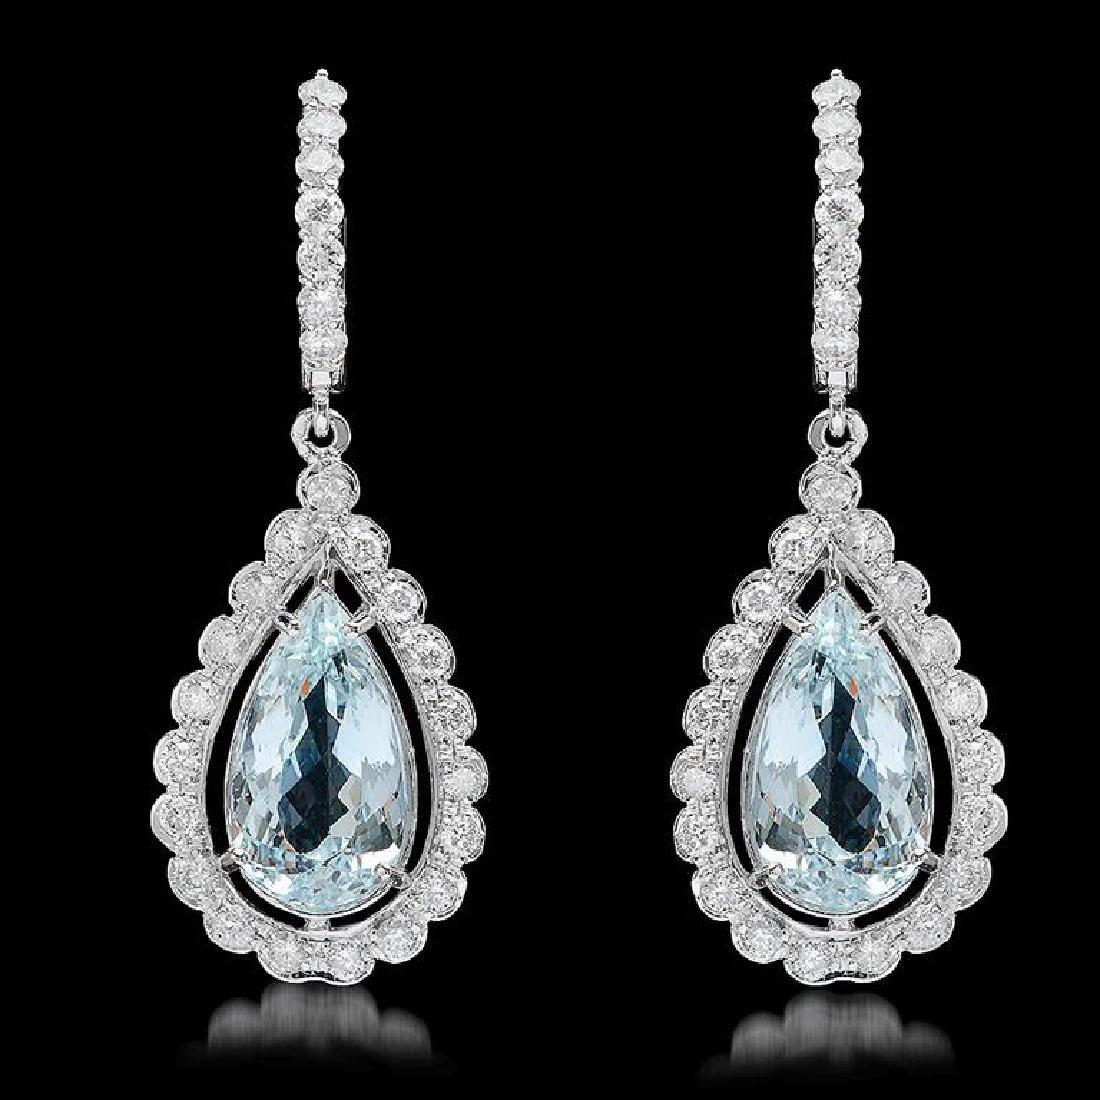 14k Gold 7.68ct Aquamarine 1.65ct Diamond Earrings